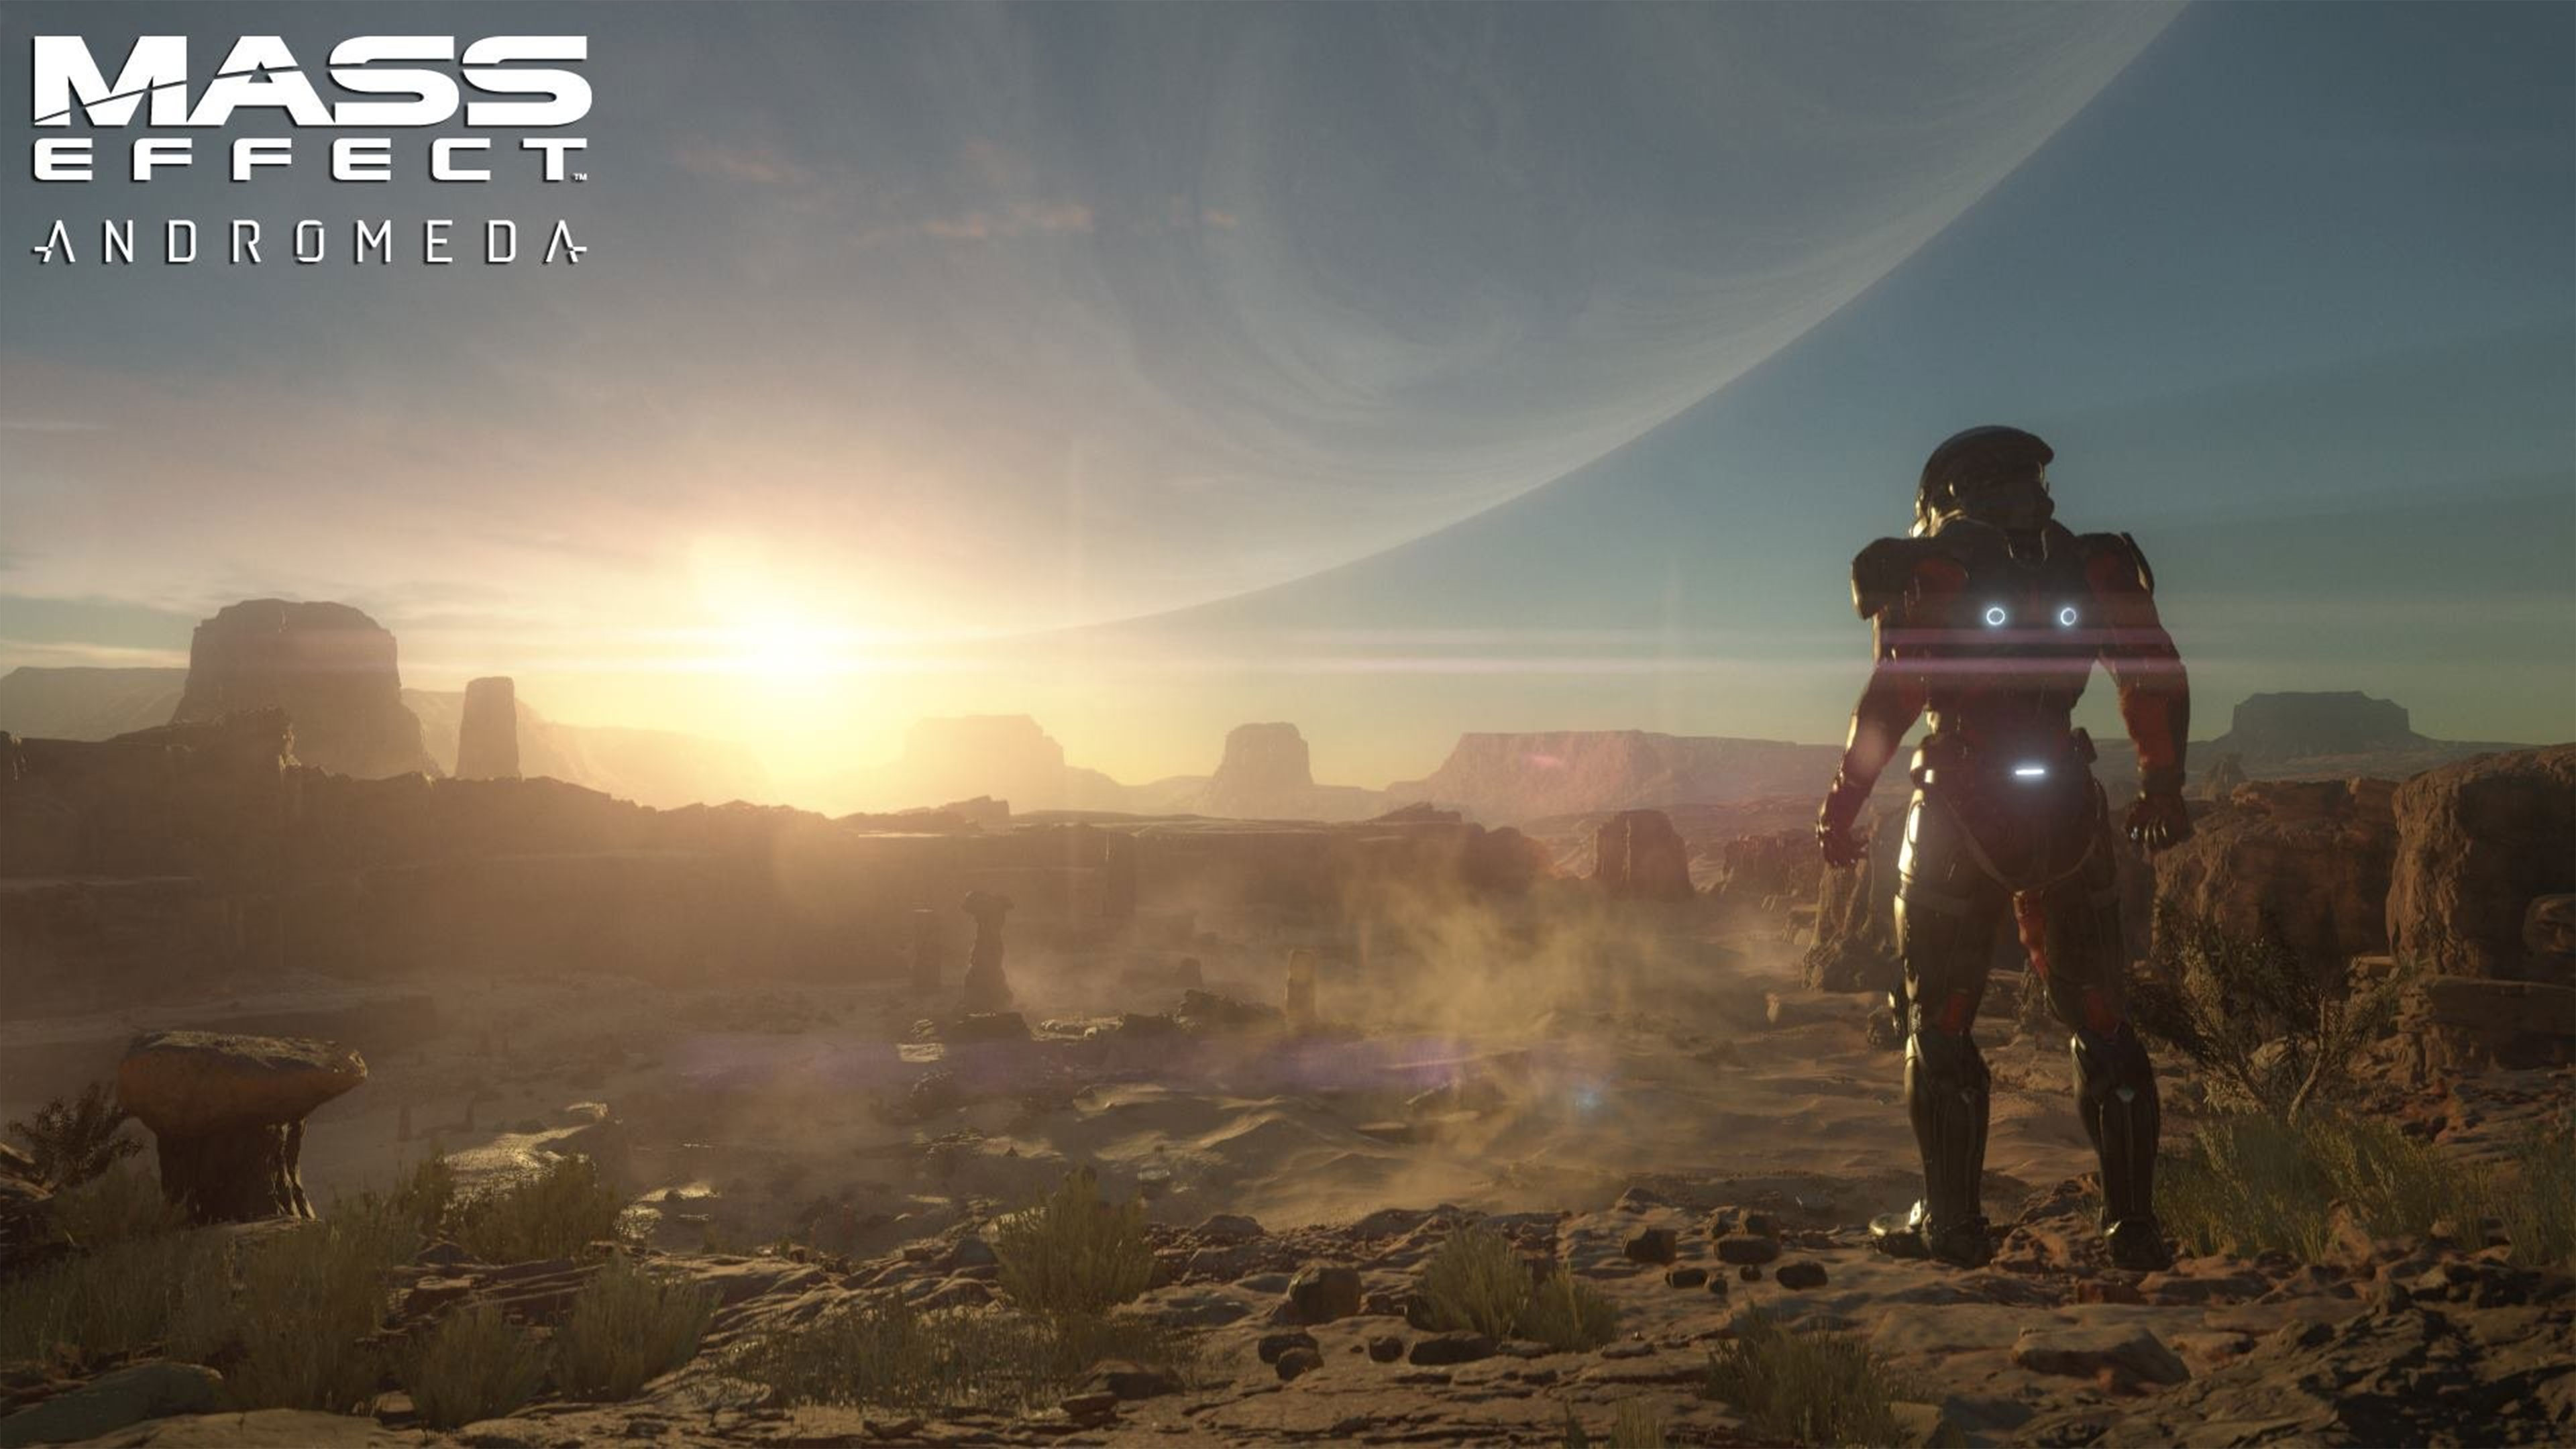 Mass Effect Andromeda 4k Wallpaper Mass Effect Andromeda